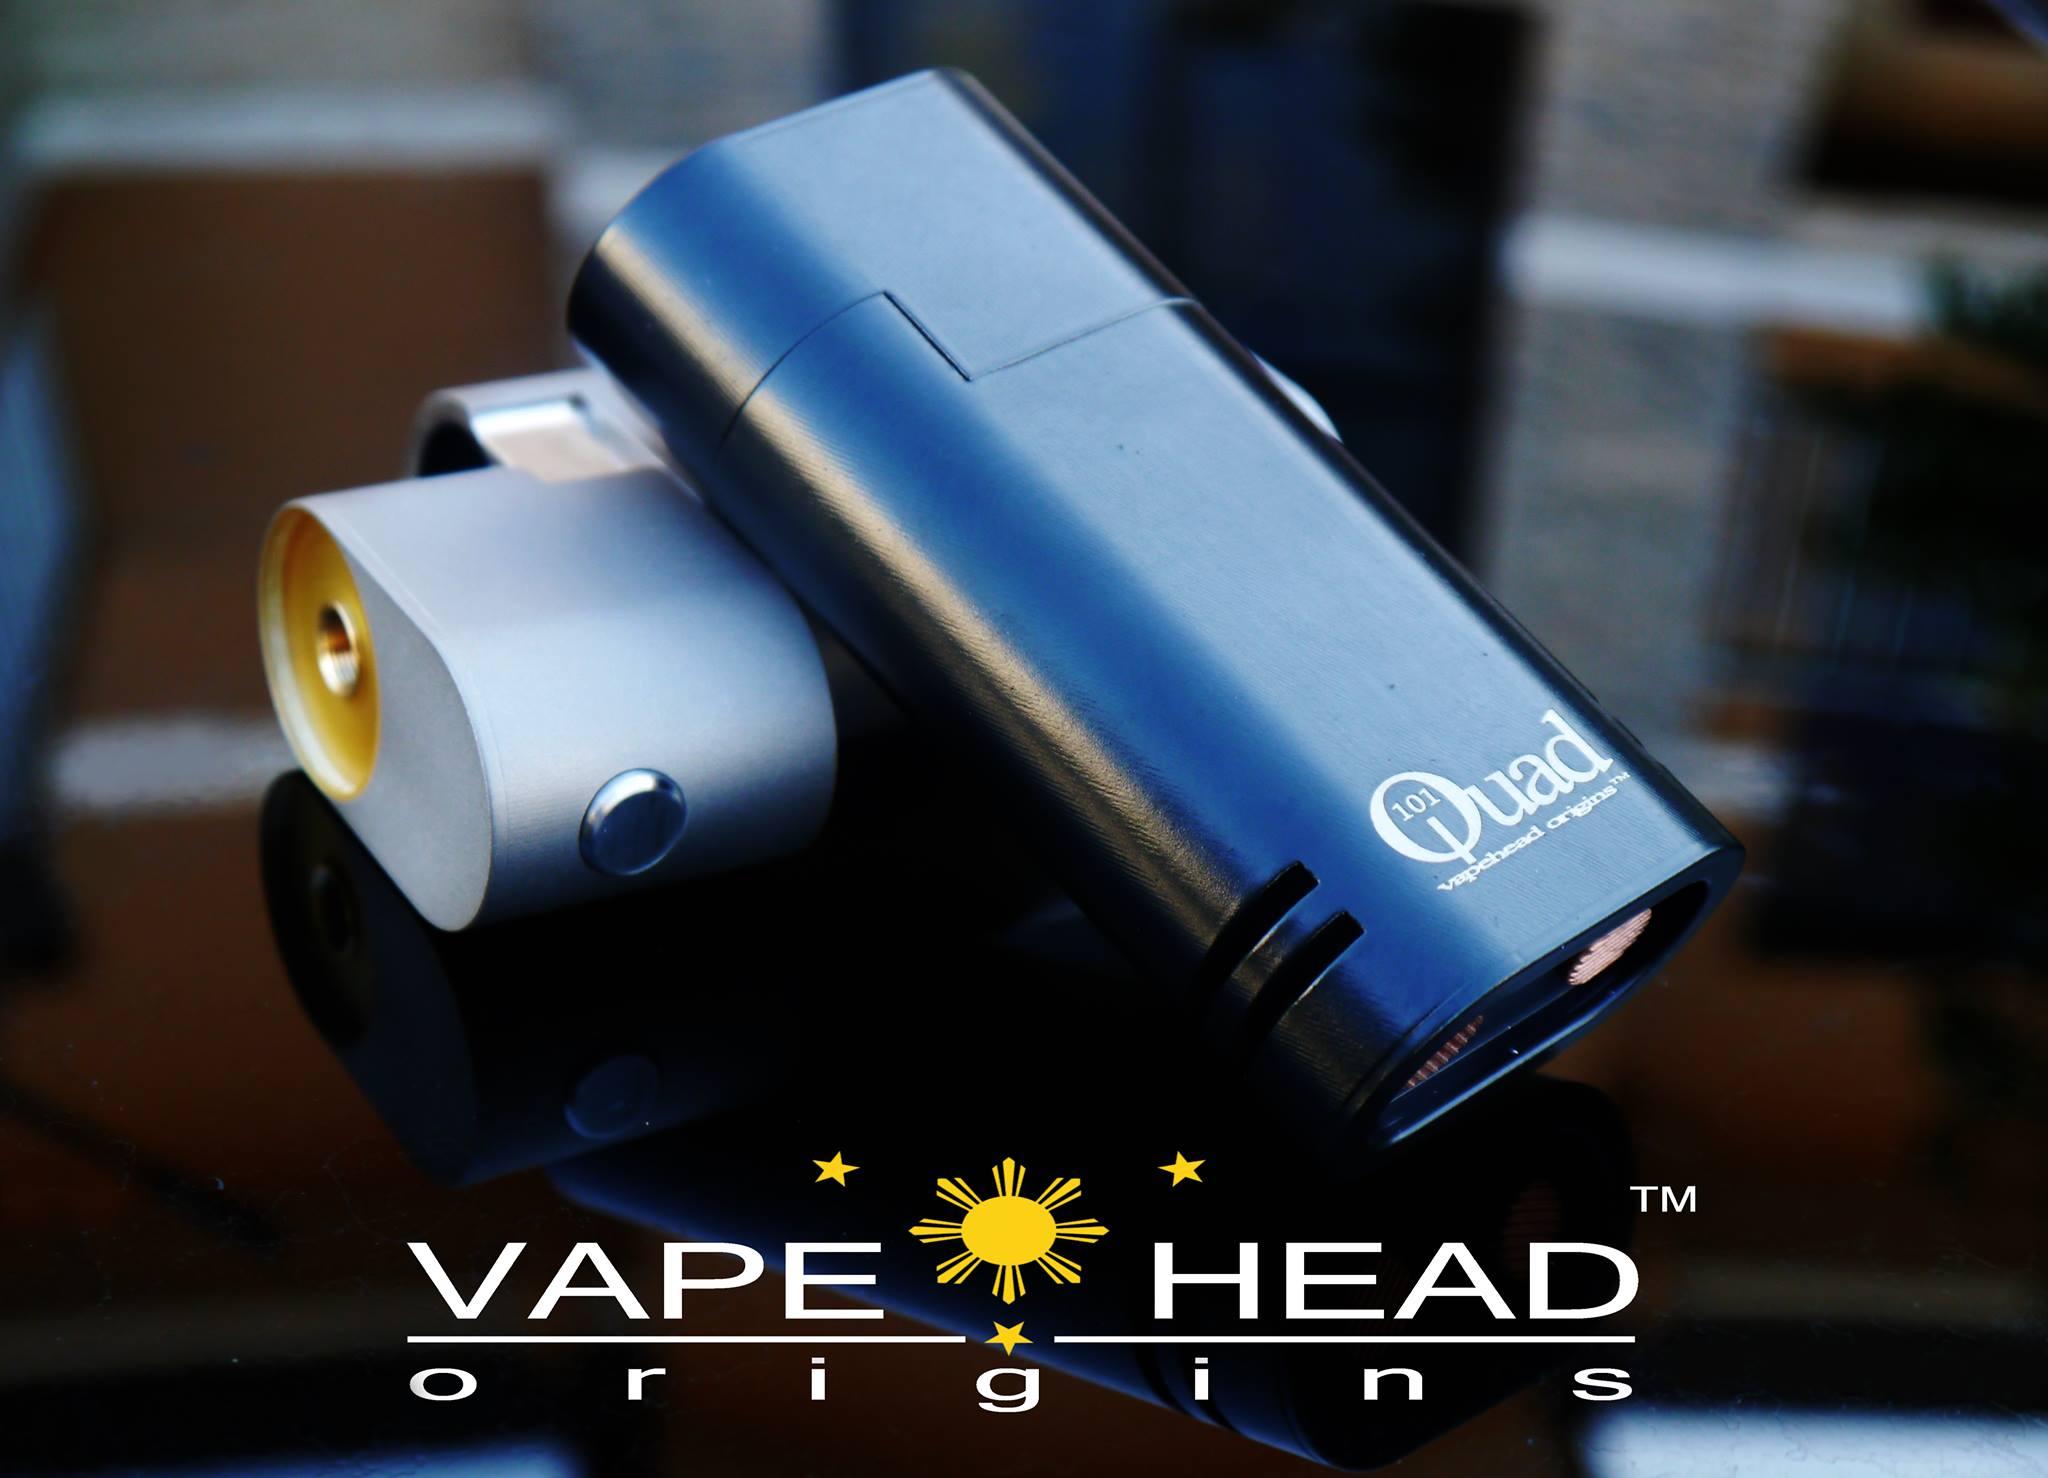 Quad Box Vapehead origins